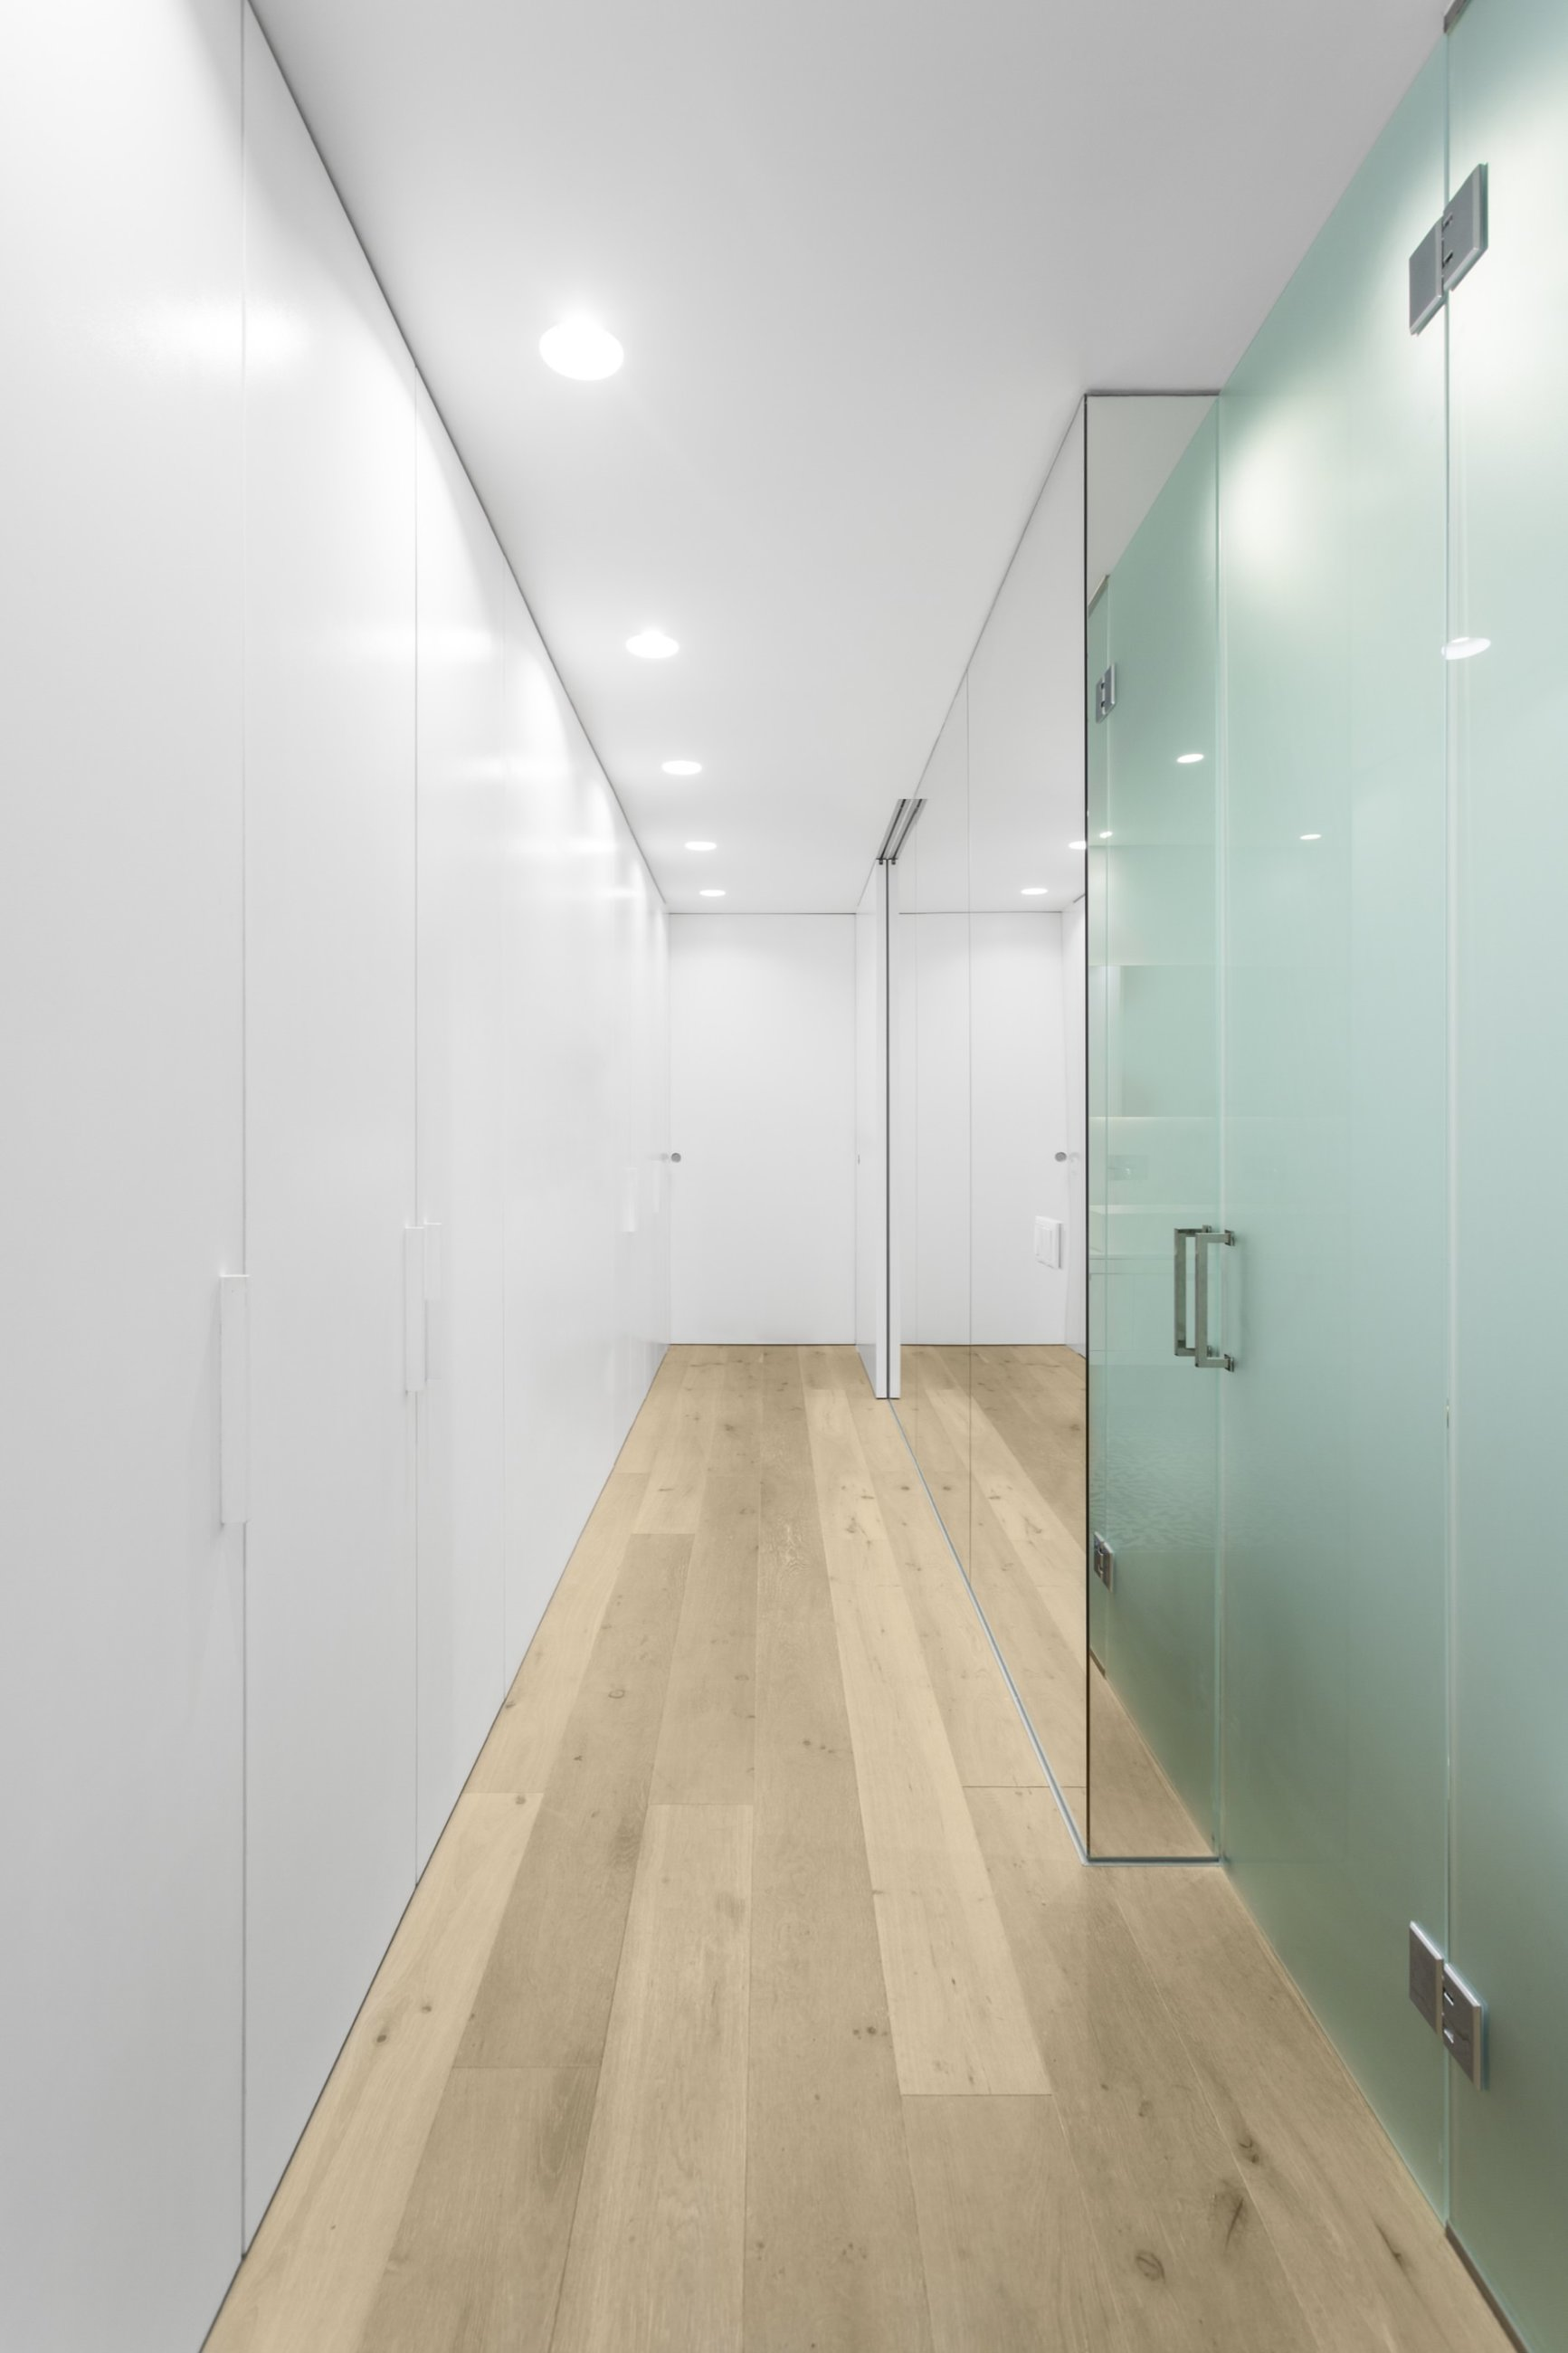 Apartamento Barcelona Arquitecto Paulo Martins 12 do fotografo Ivo Tavares Studio